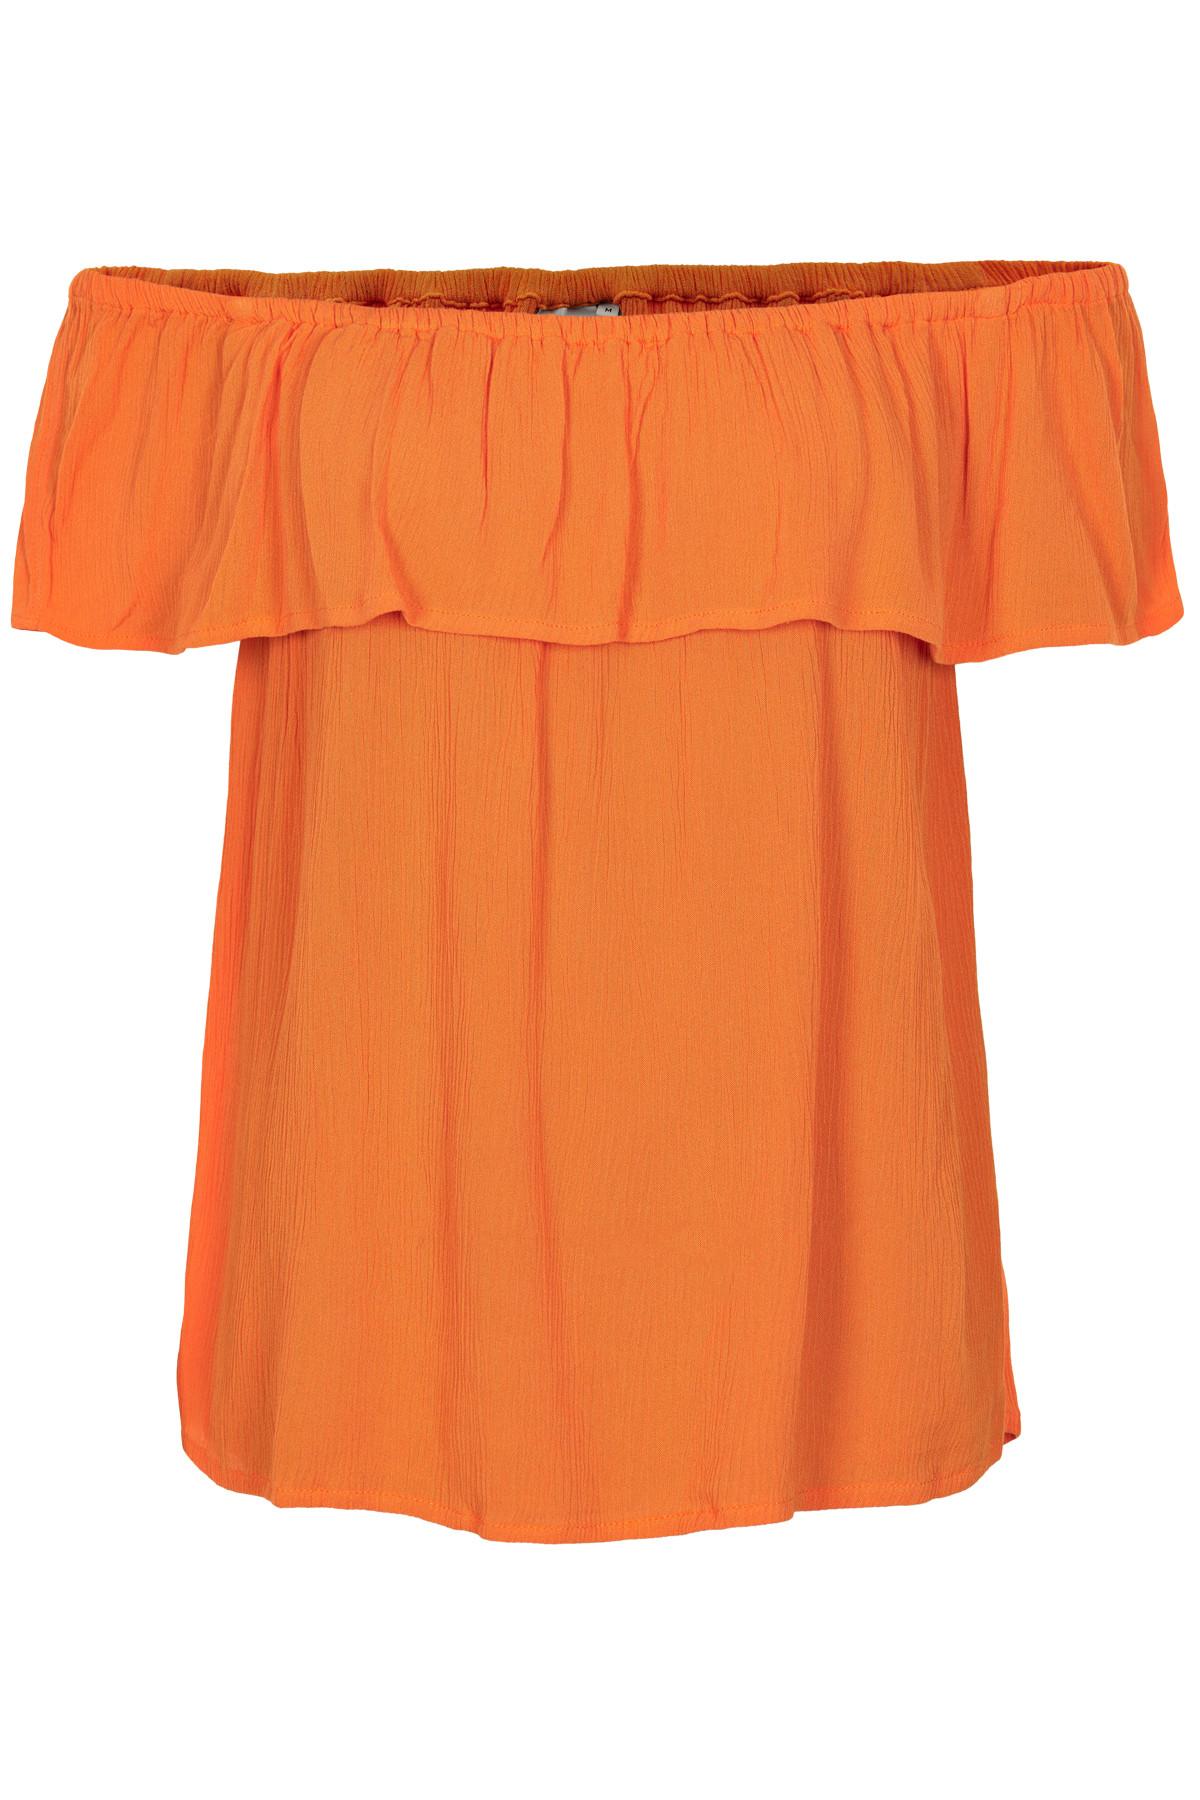 Image of   ICHI MARRAKECH TOP 20103351 17667 (Russet Orange 17667, M)